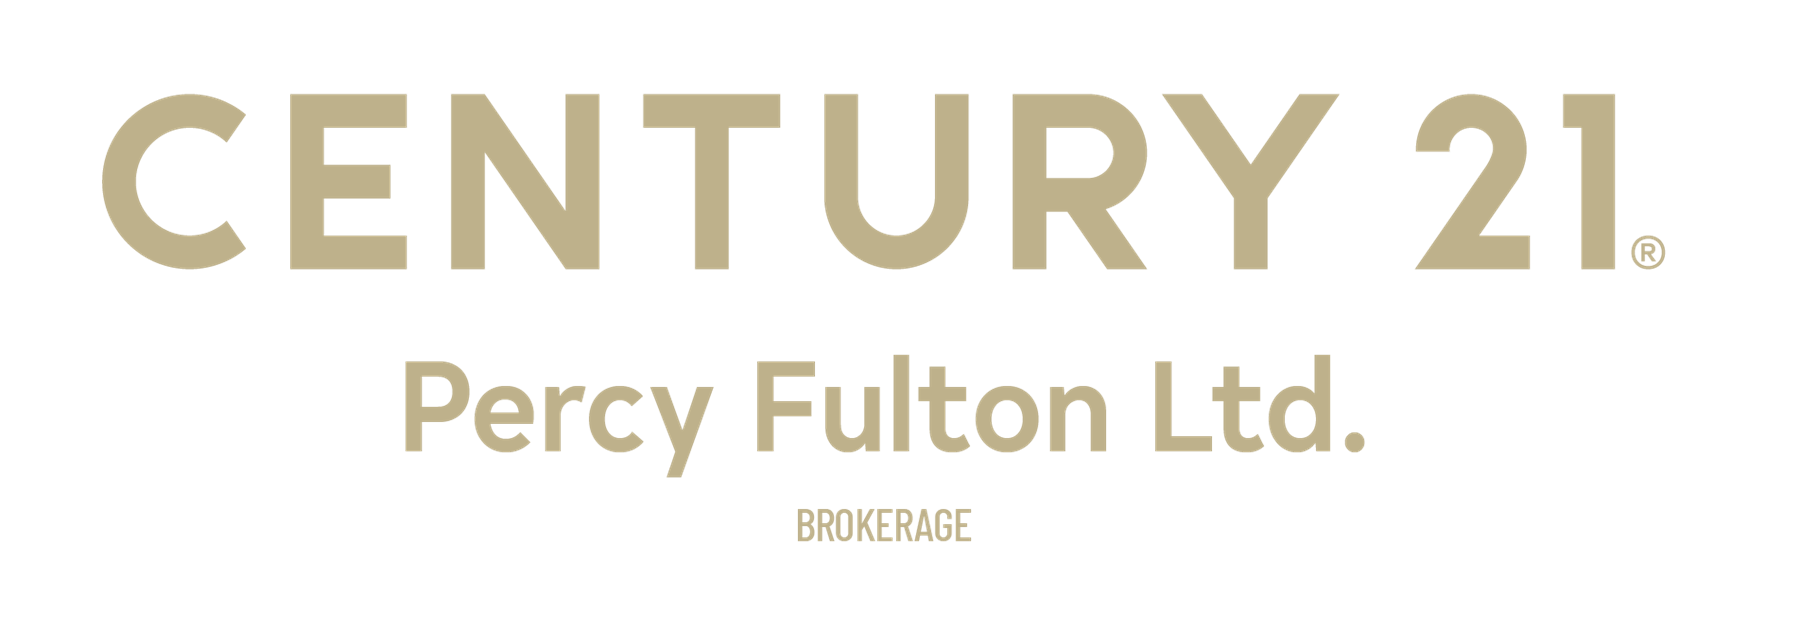 CENTURY 21 PERCY FULTON LTD., BROKERAGE